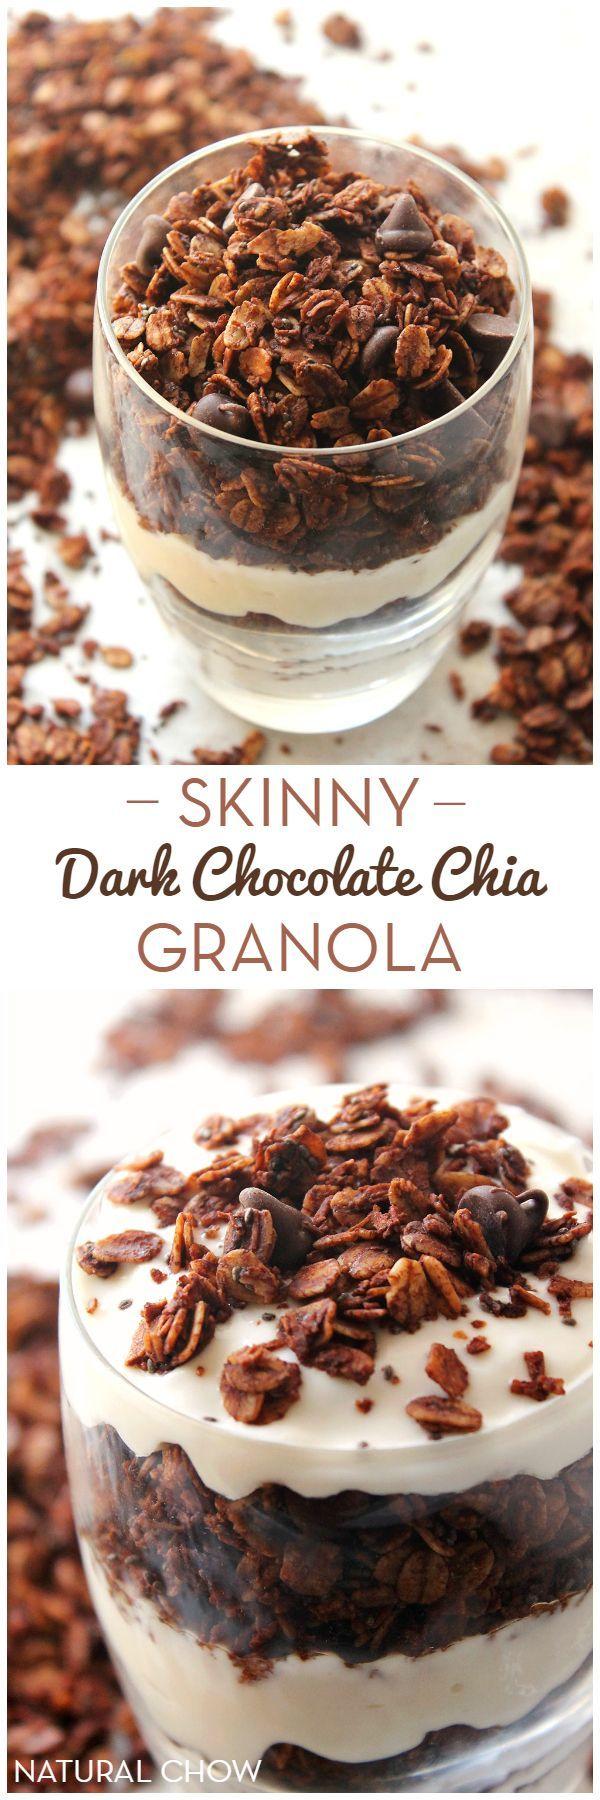 Skinny Dark Chocolate Granola -